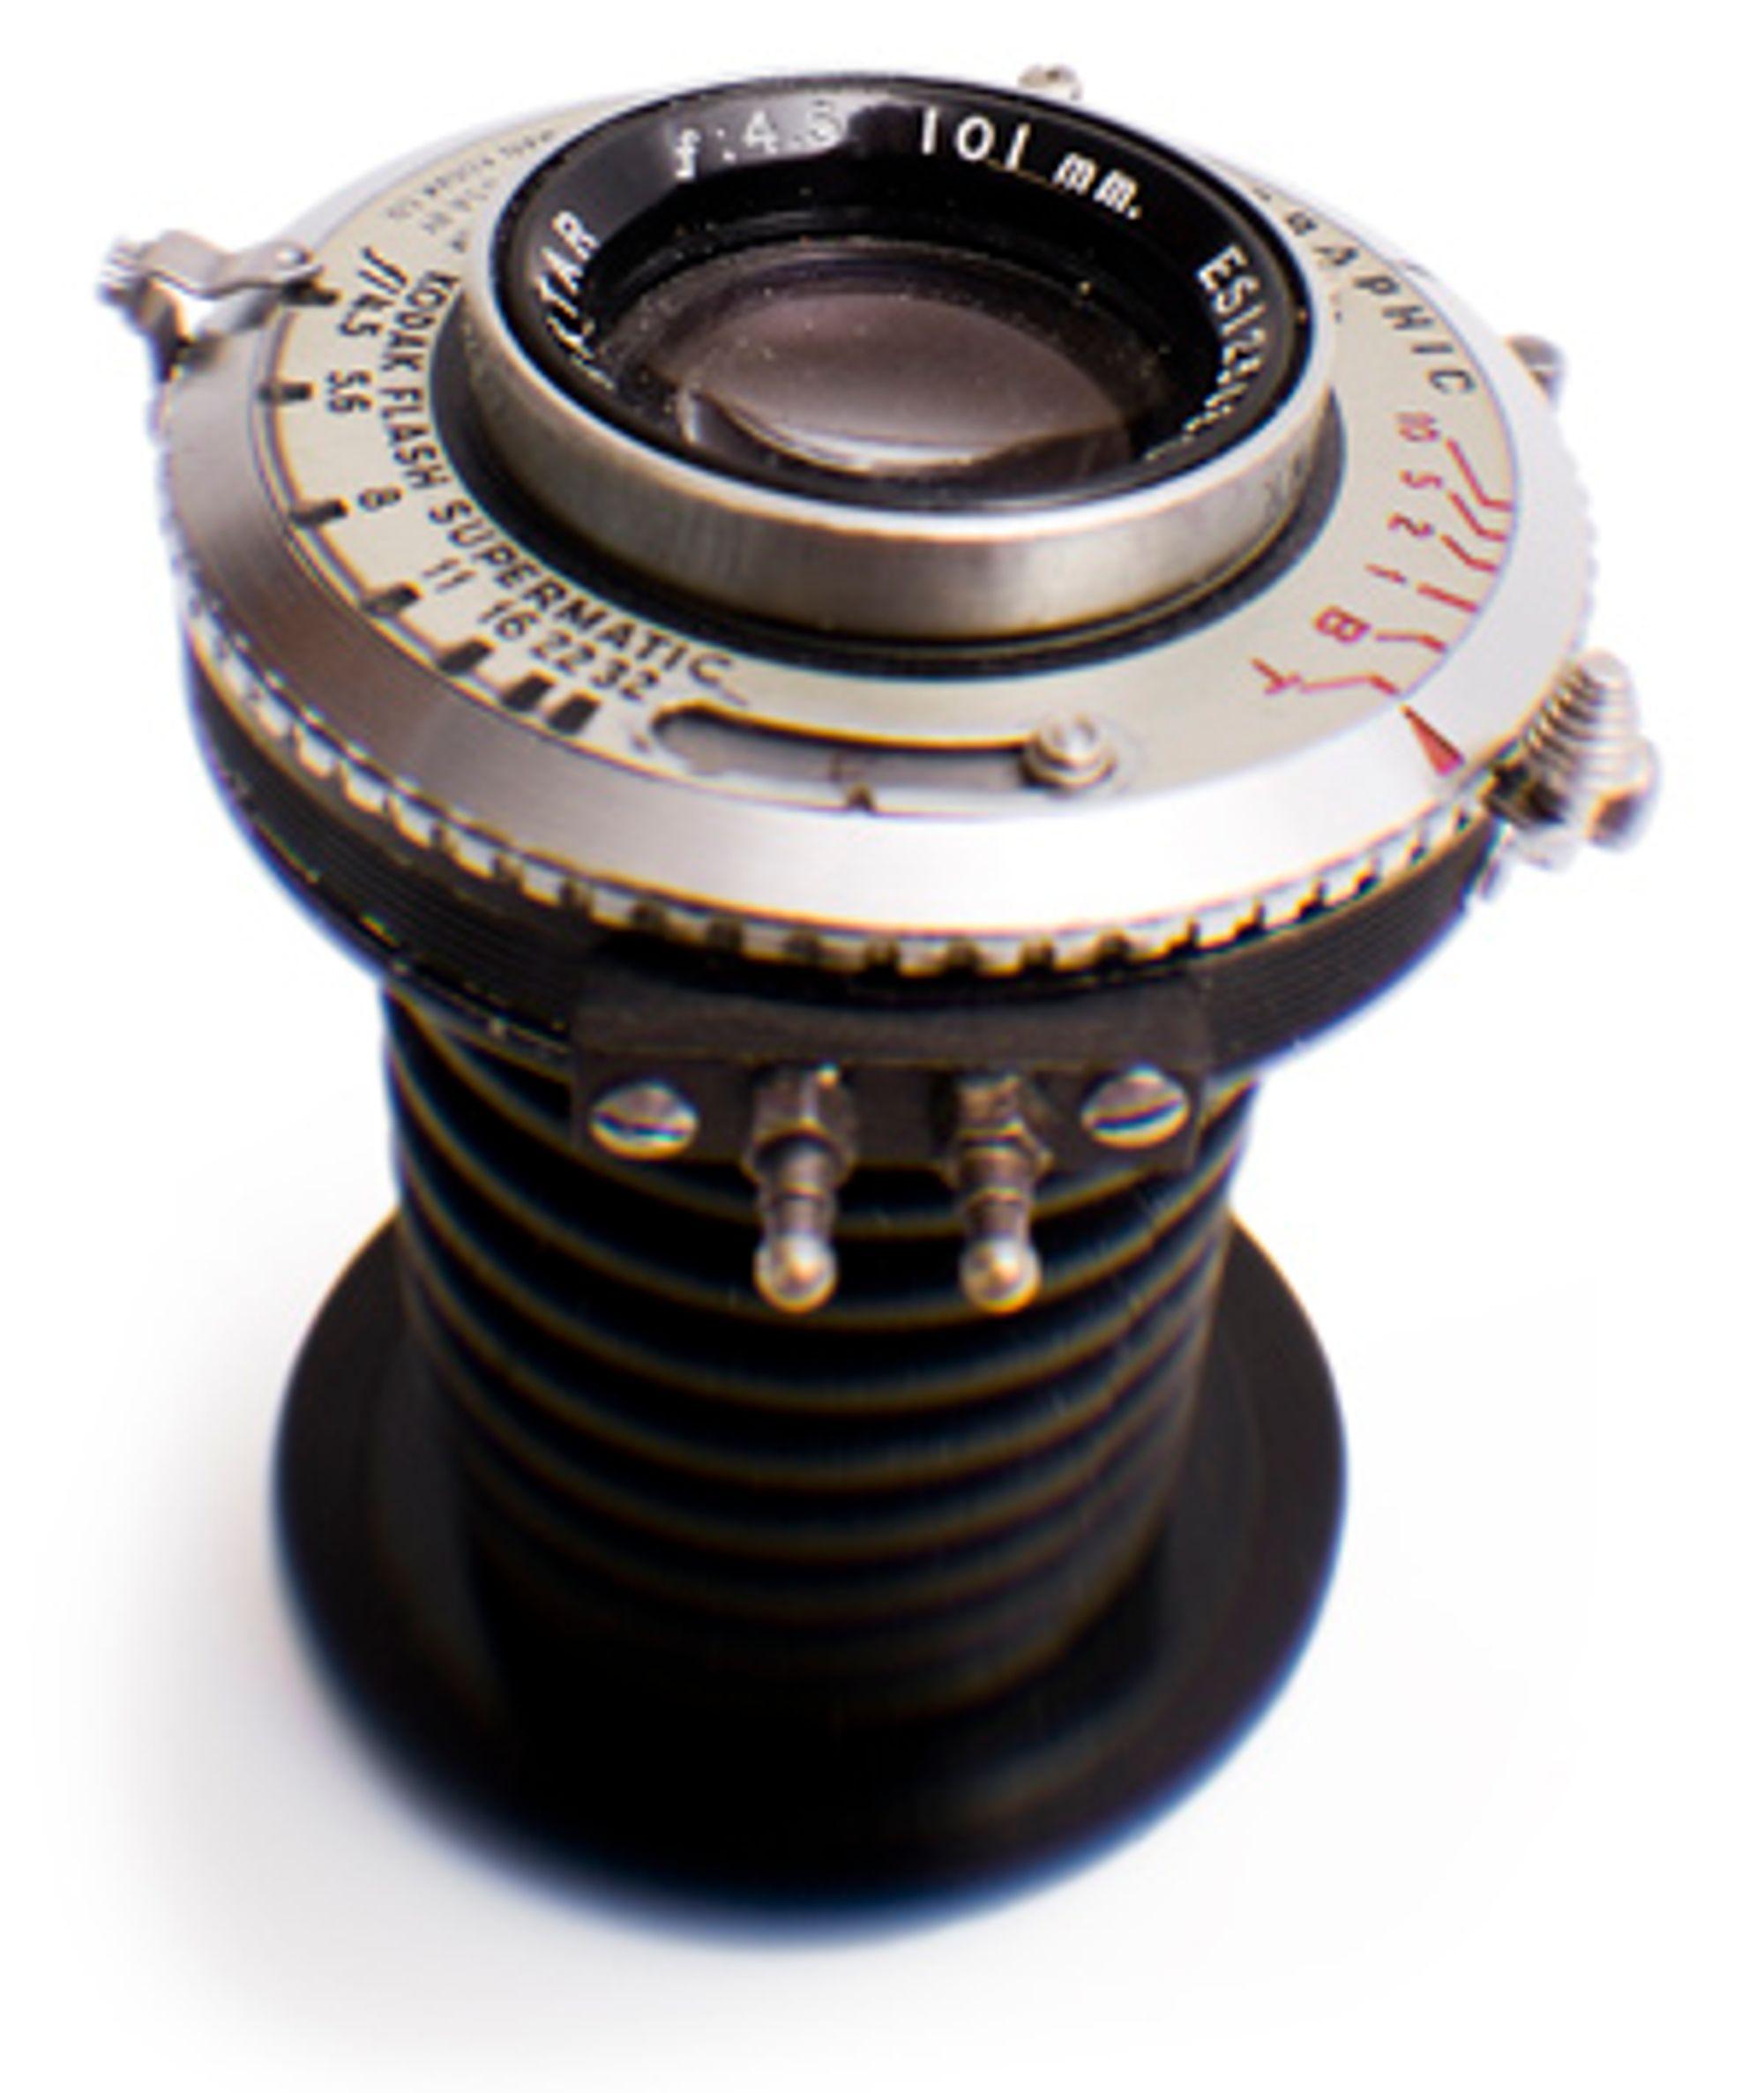 Lensbaby-prototypen